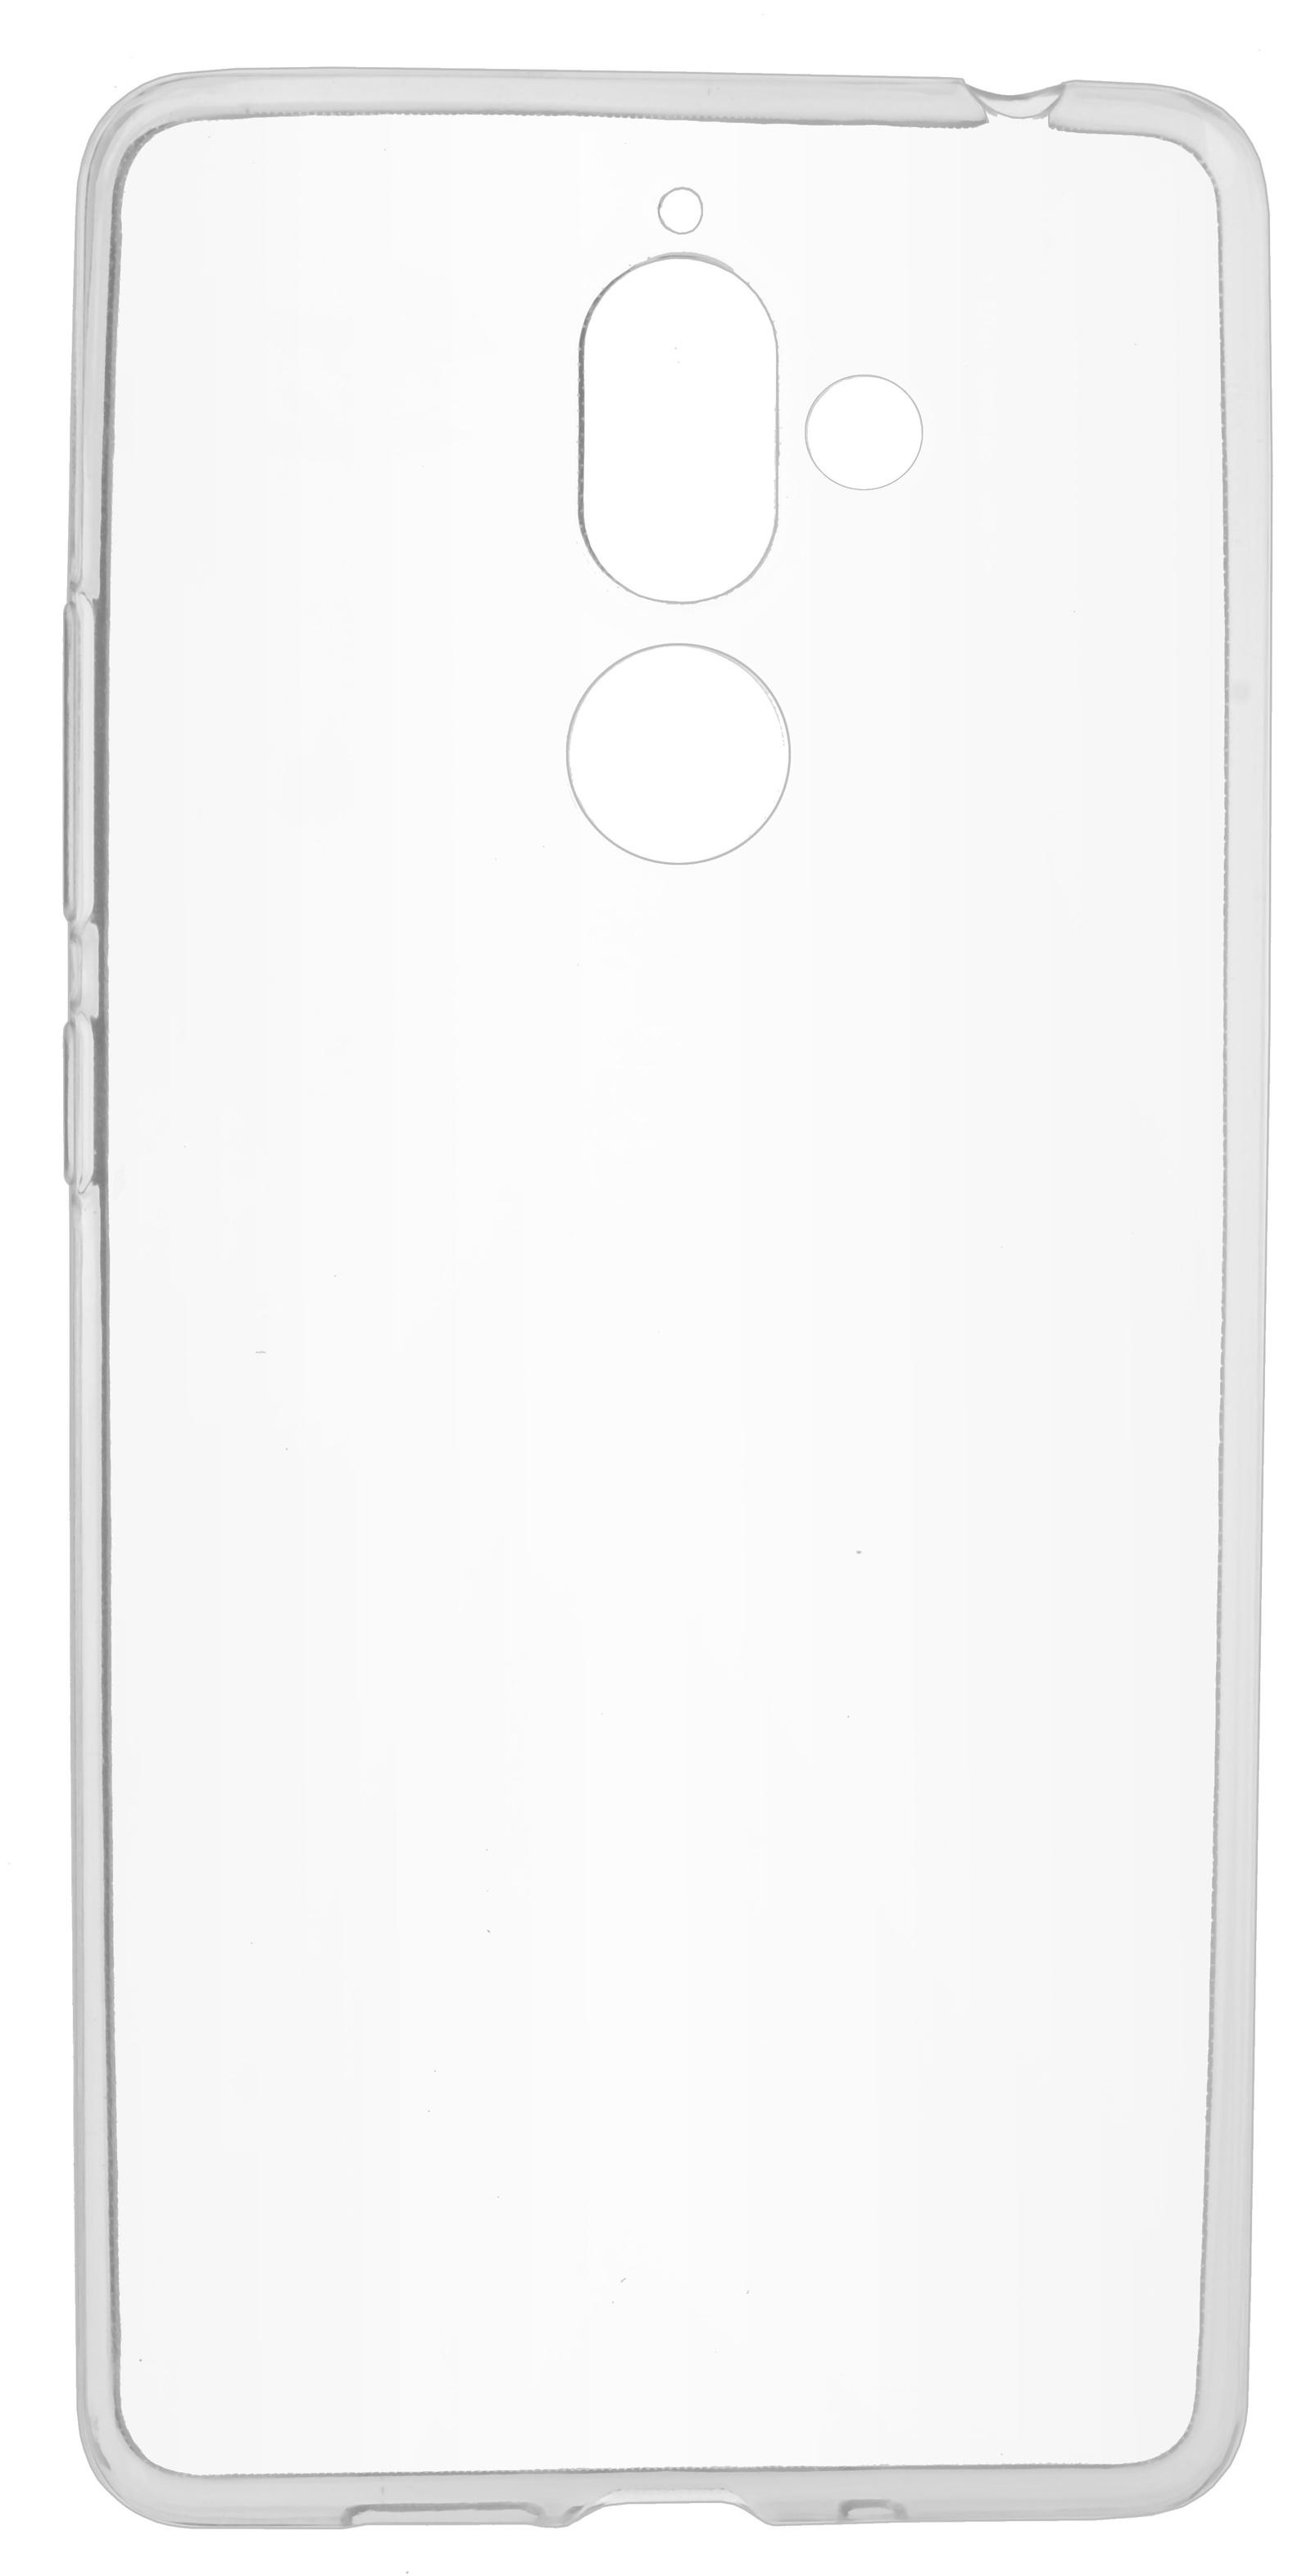 цена на Чехол для сотового телефона skinBOX Slim Silicone, 4660041404326, прозрачный